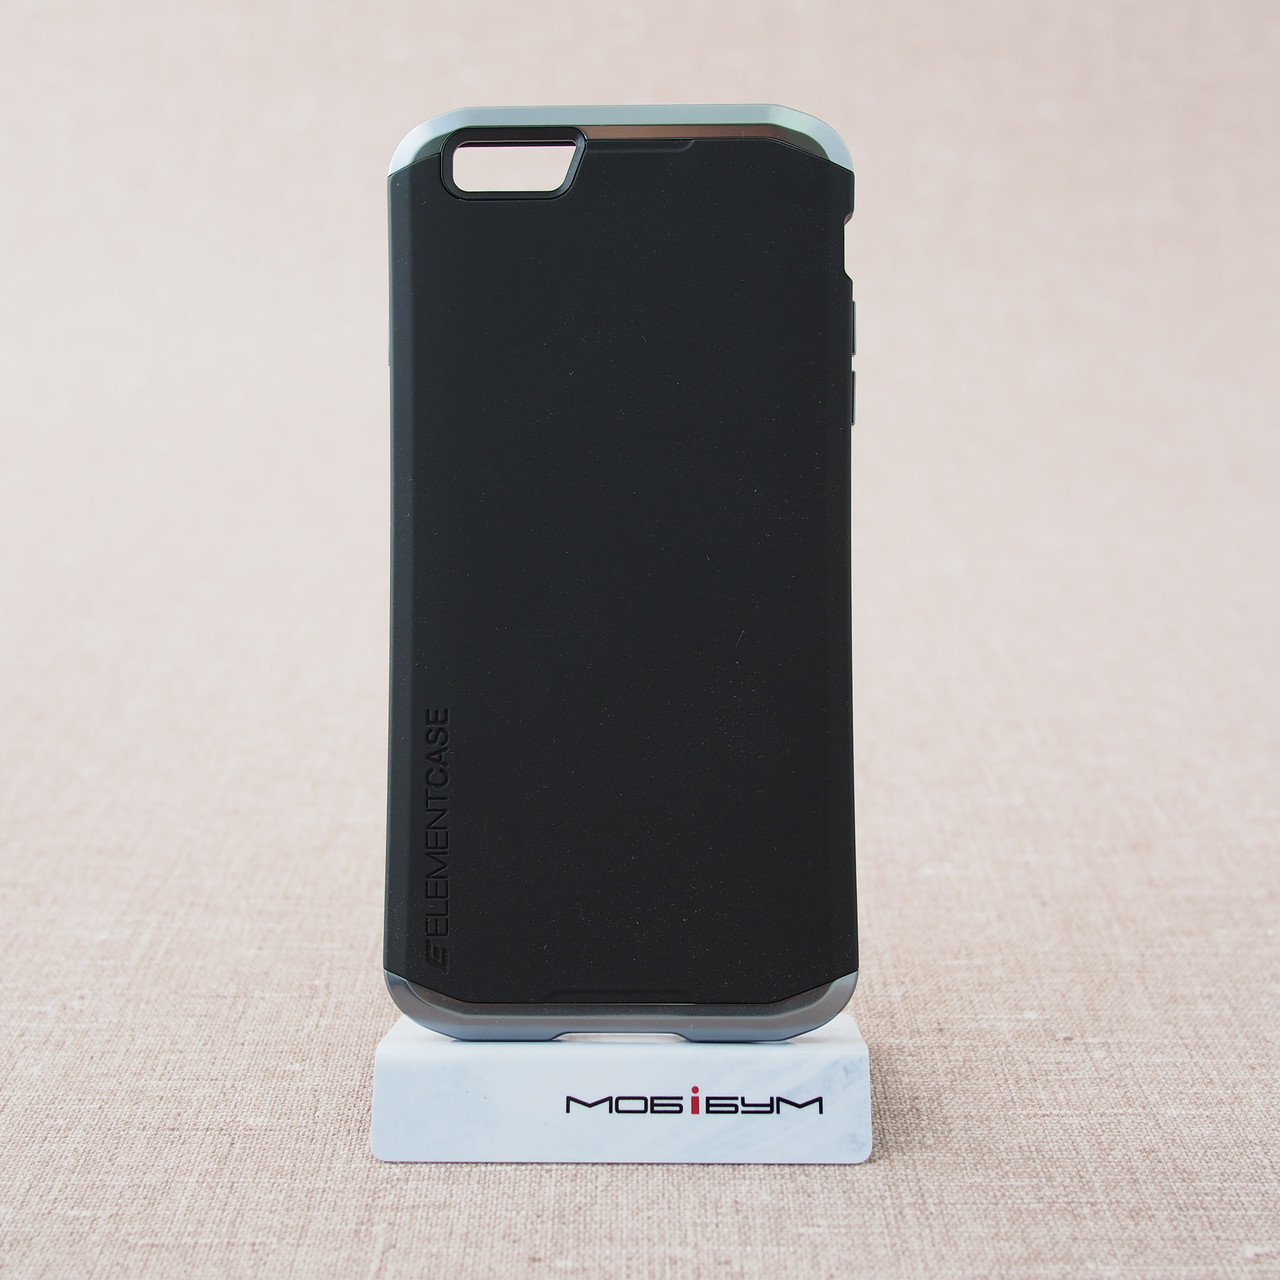 Чехол ElementCASE Solace II iPhone 6 Plus black (EMT-322-101E-01) EAN/UPC: 640947792394